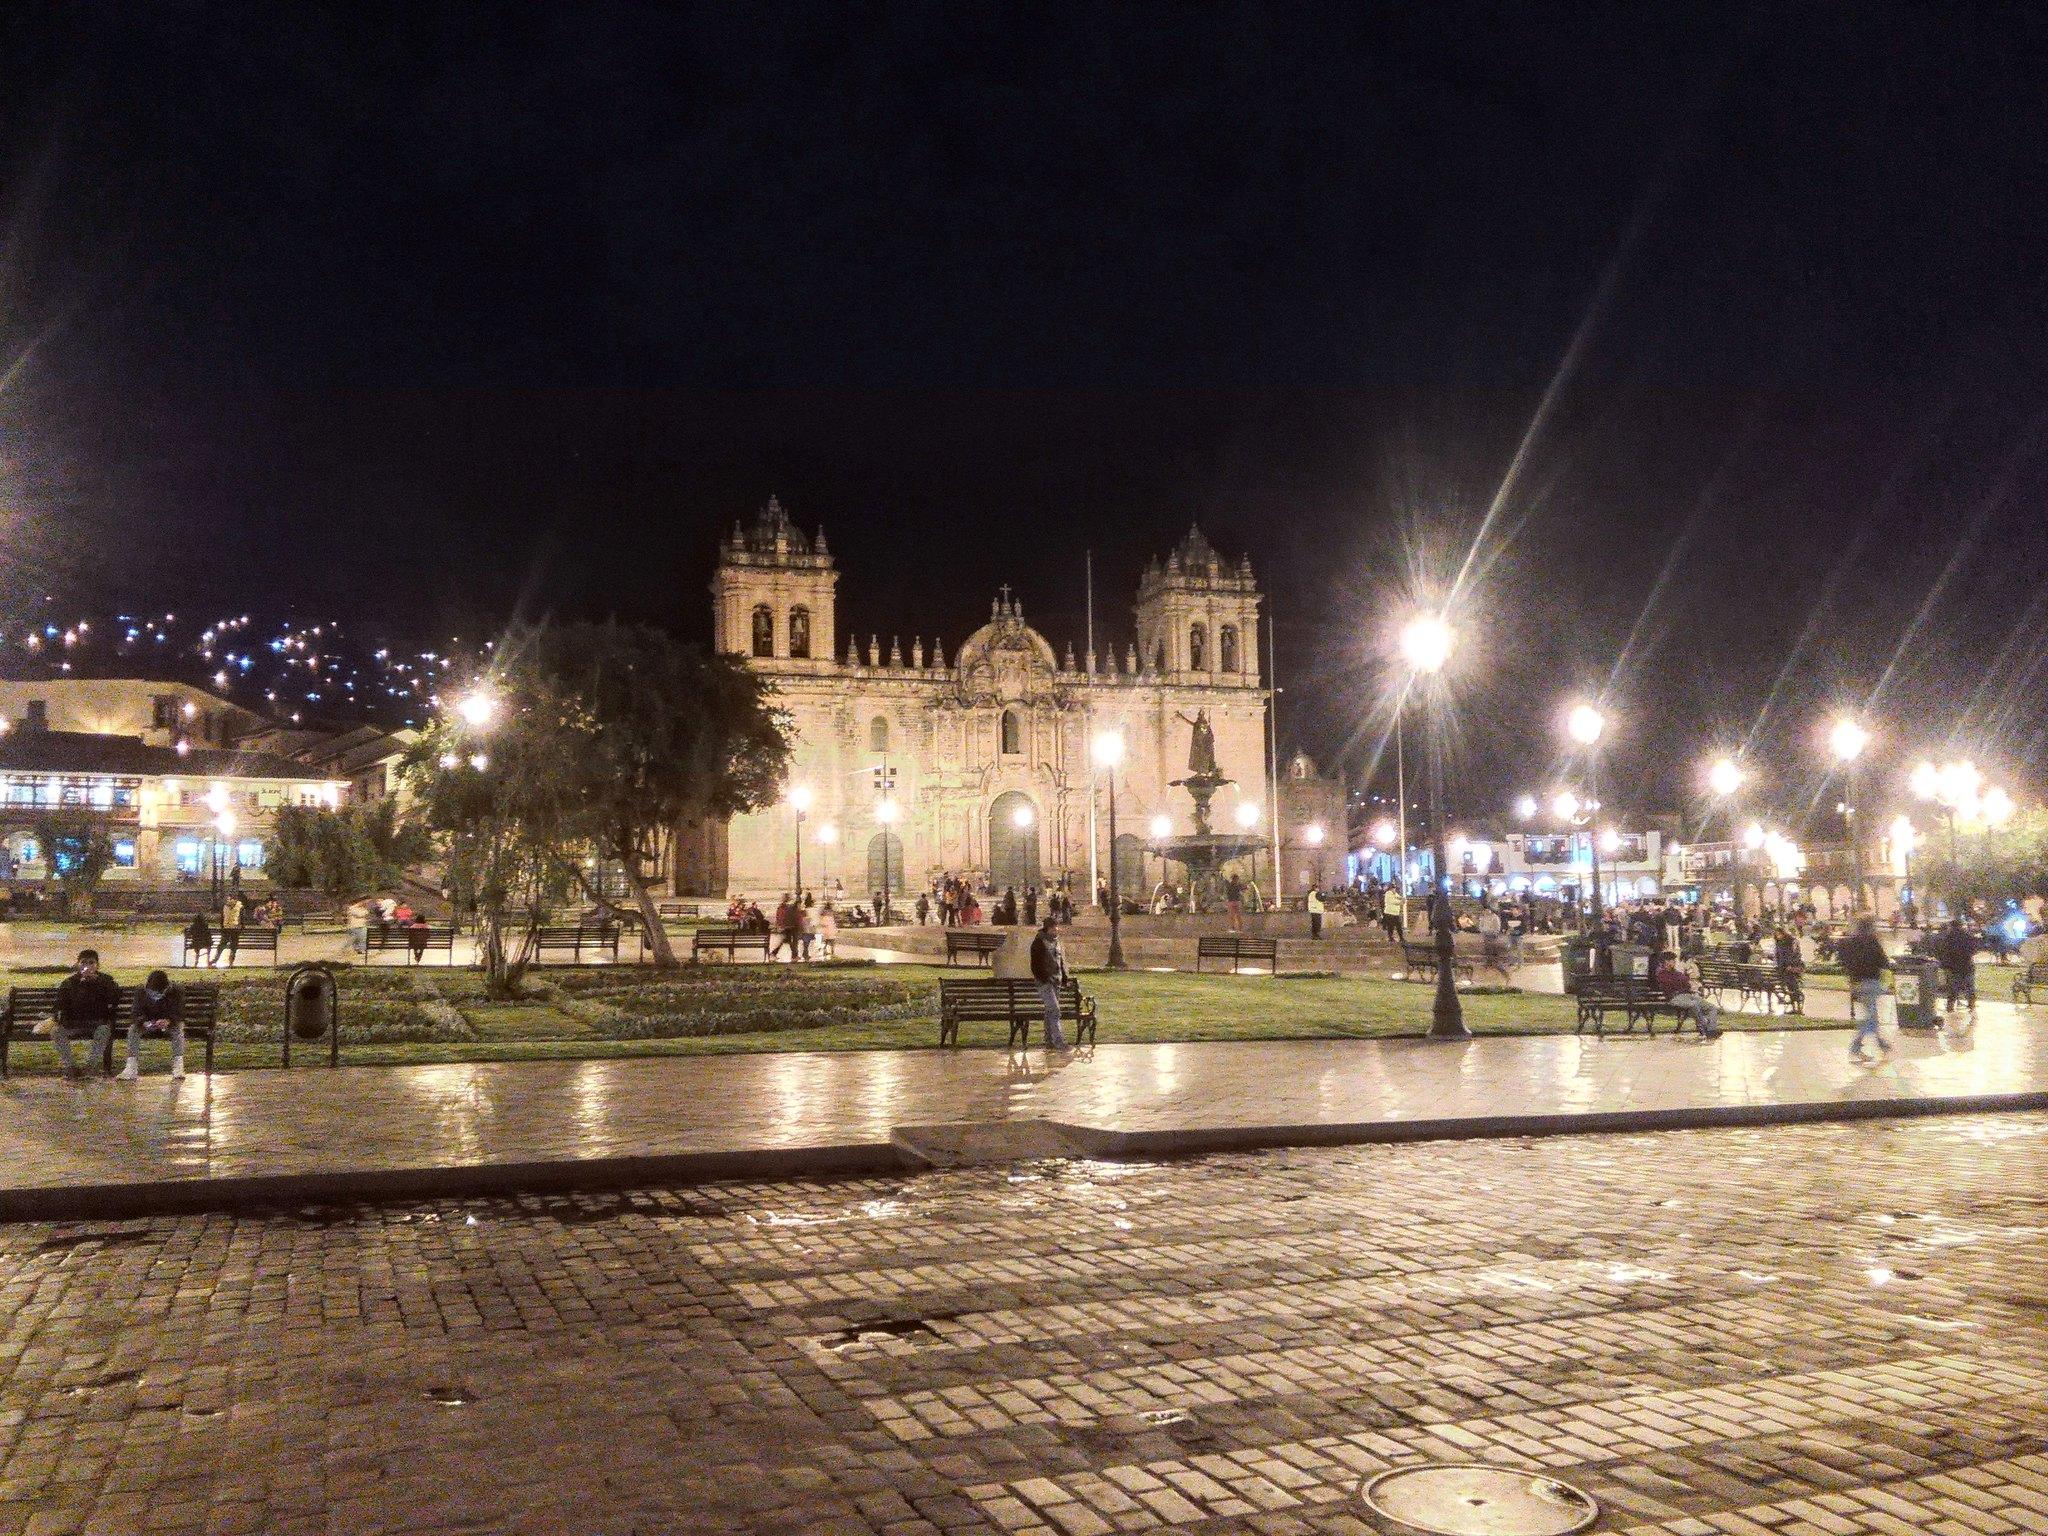 Cusco's Plaza de Armas at night